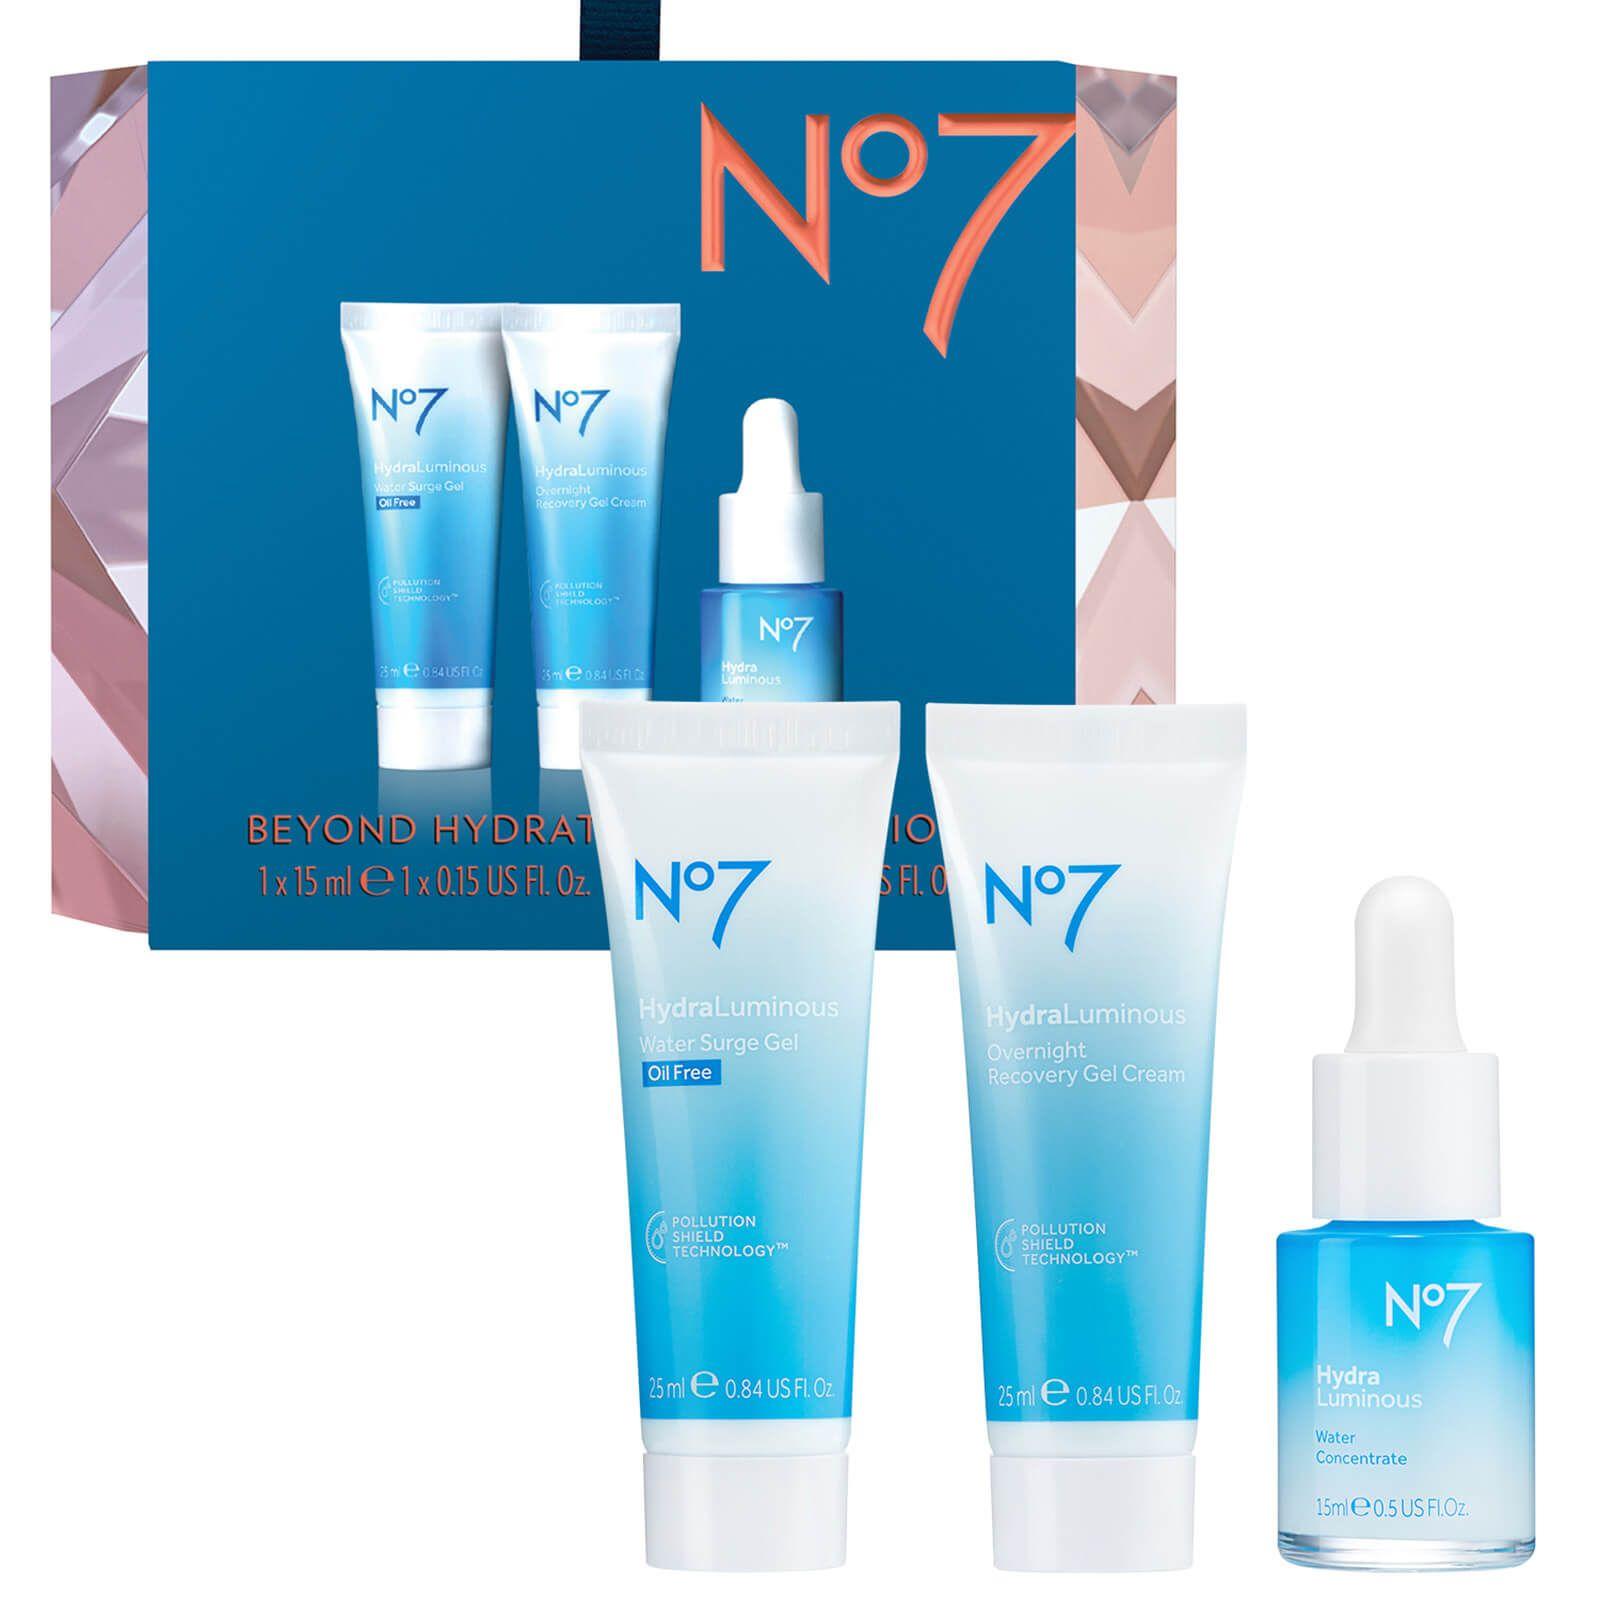 Hydraluminous Overnight Recovery Gel Cream Dull Skin Natural Glow